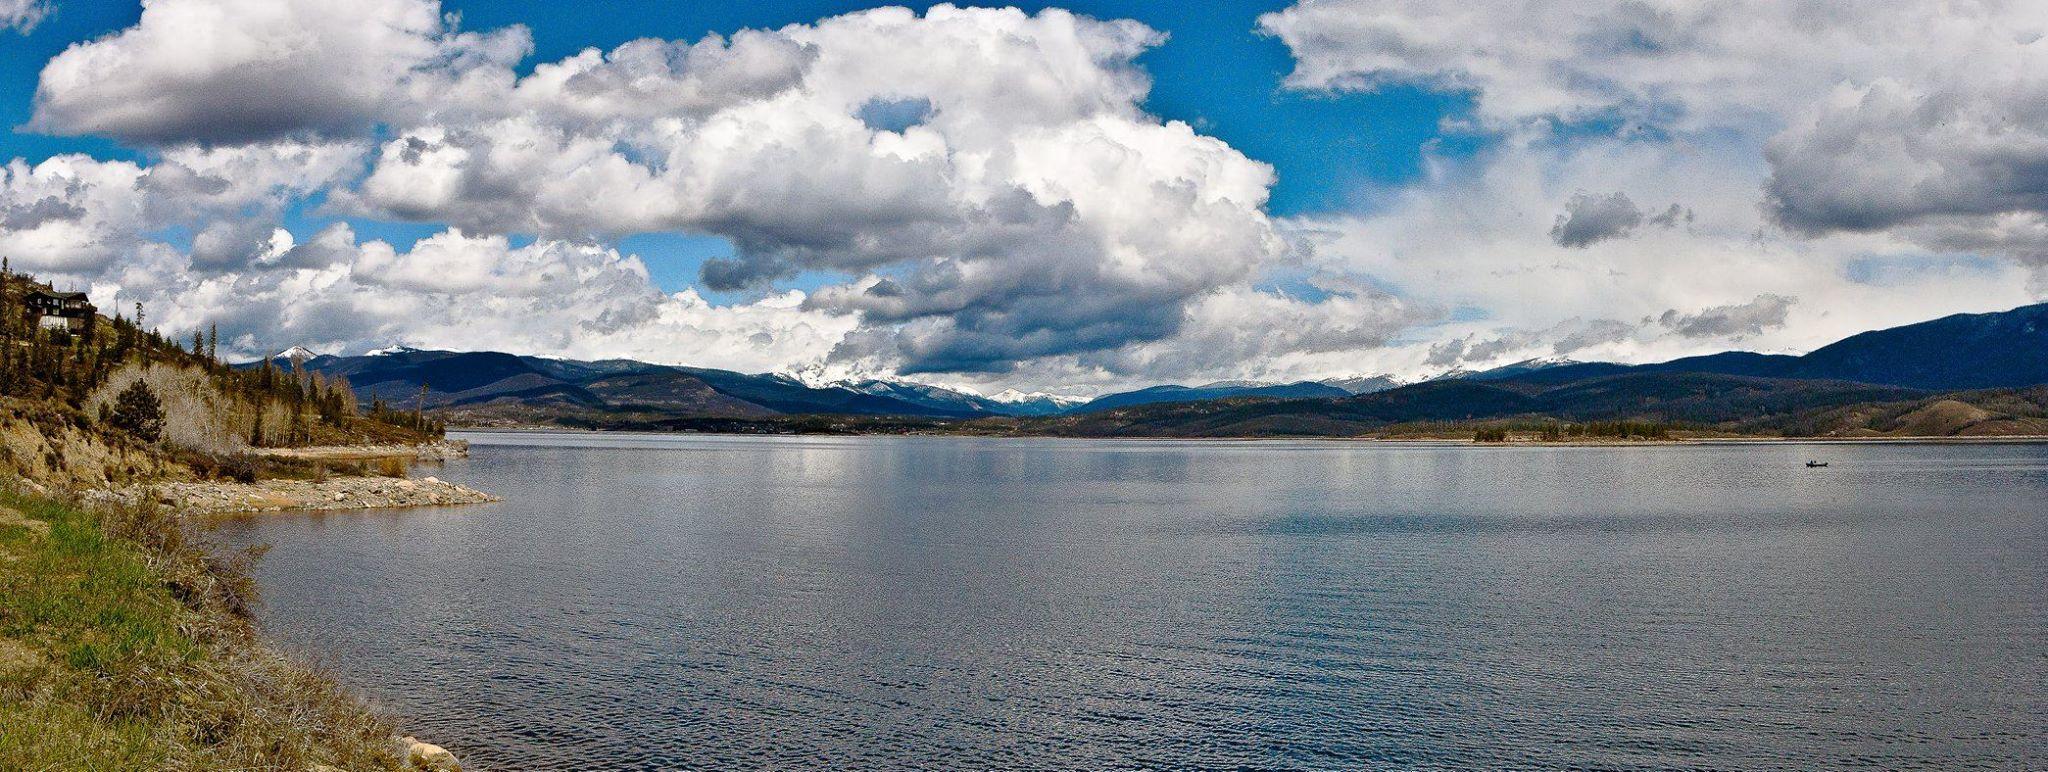 Big sky over Lake Granby